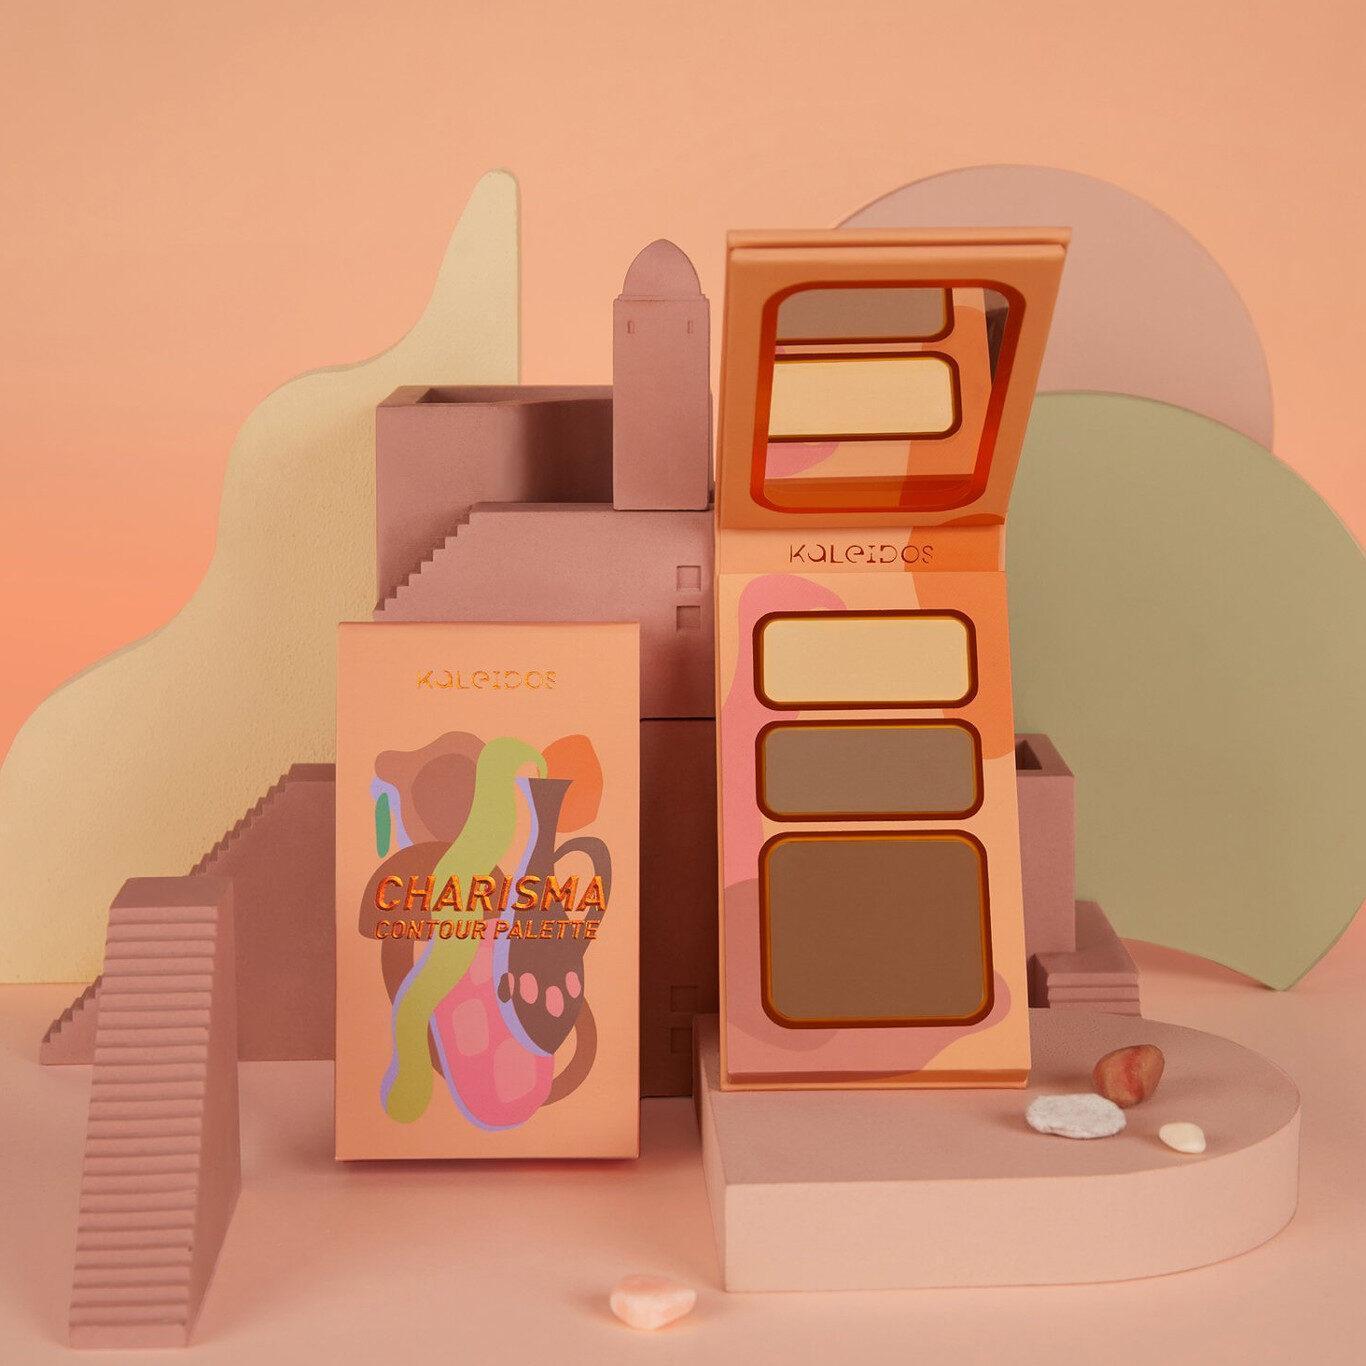 Kaleidos Makeup The Fresh Fantasy Collection Charisma Contour Warm and Medium Promo